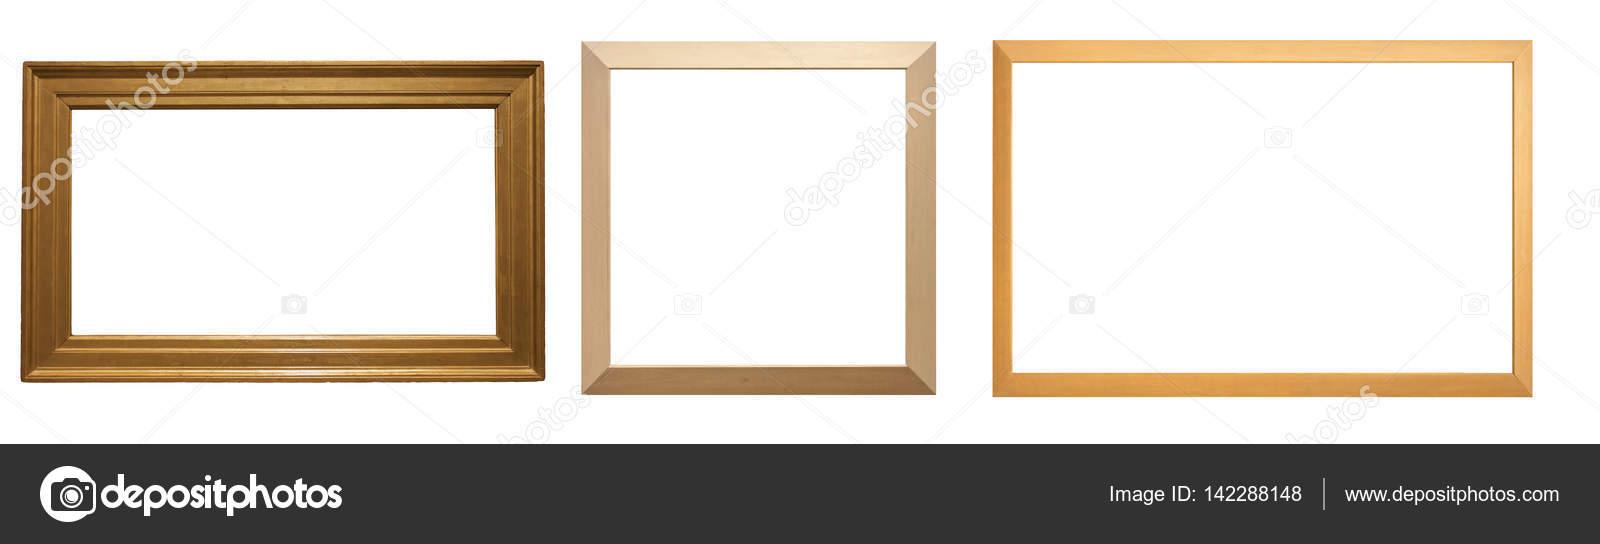 wooden frames on white background — Stock Photo © mrxiao #142288148